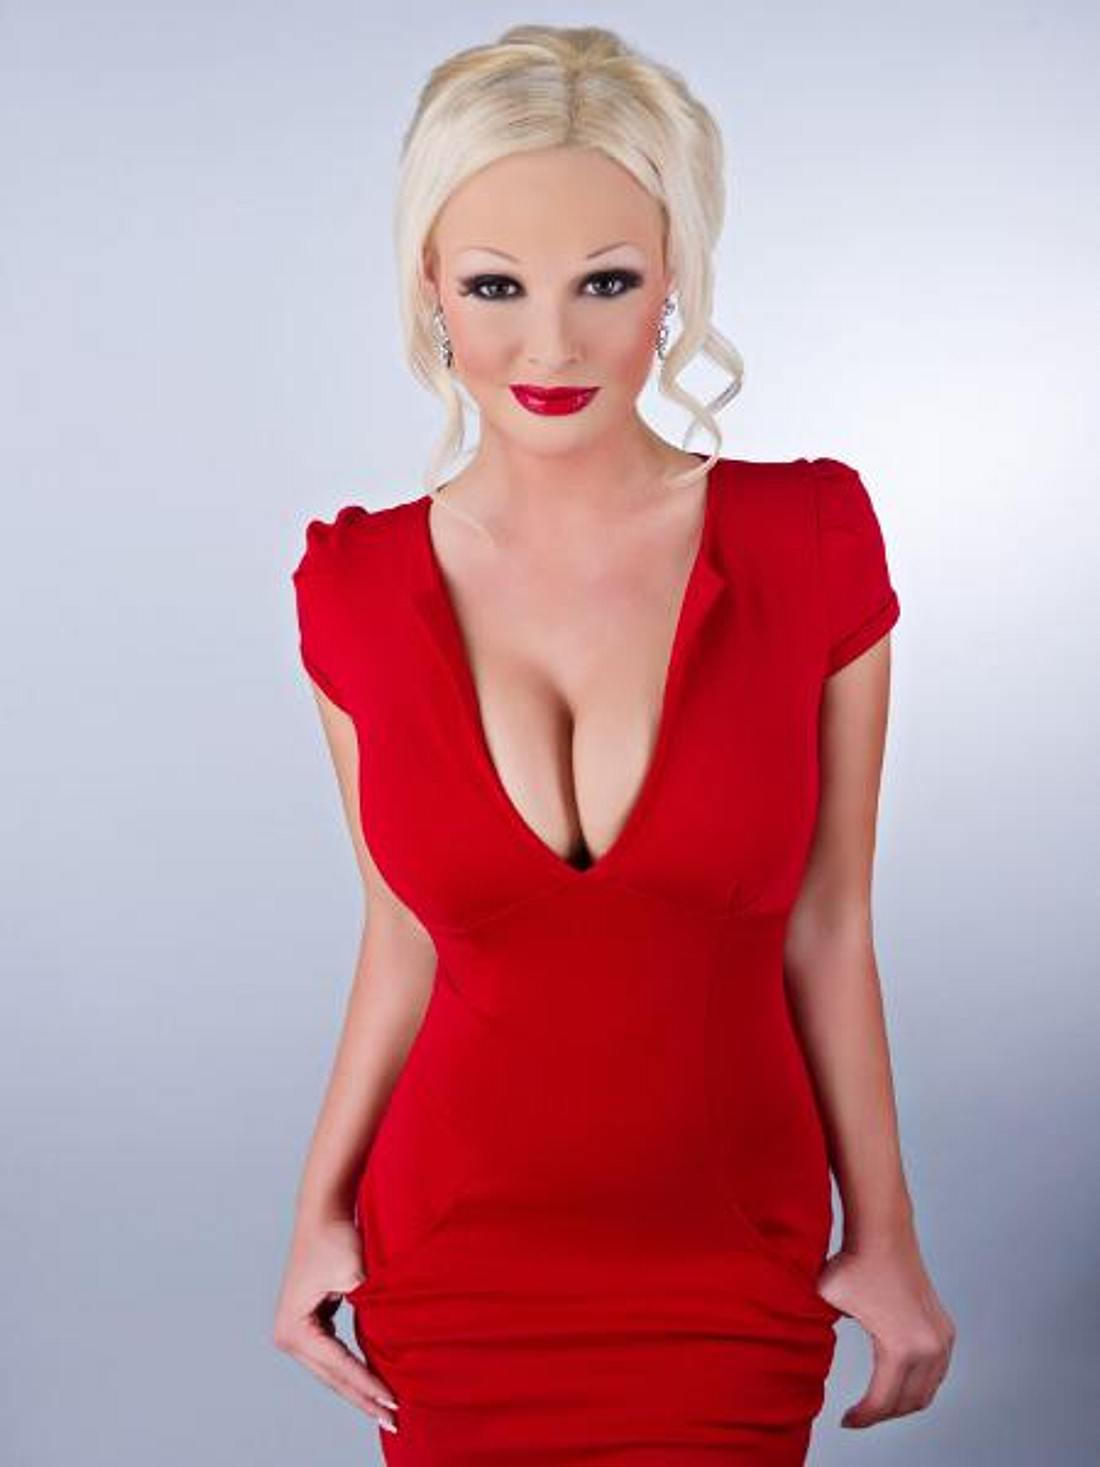 Daniela Katzenberger: Busen-Voting!Outfit 1: Rotes Kleid